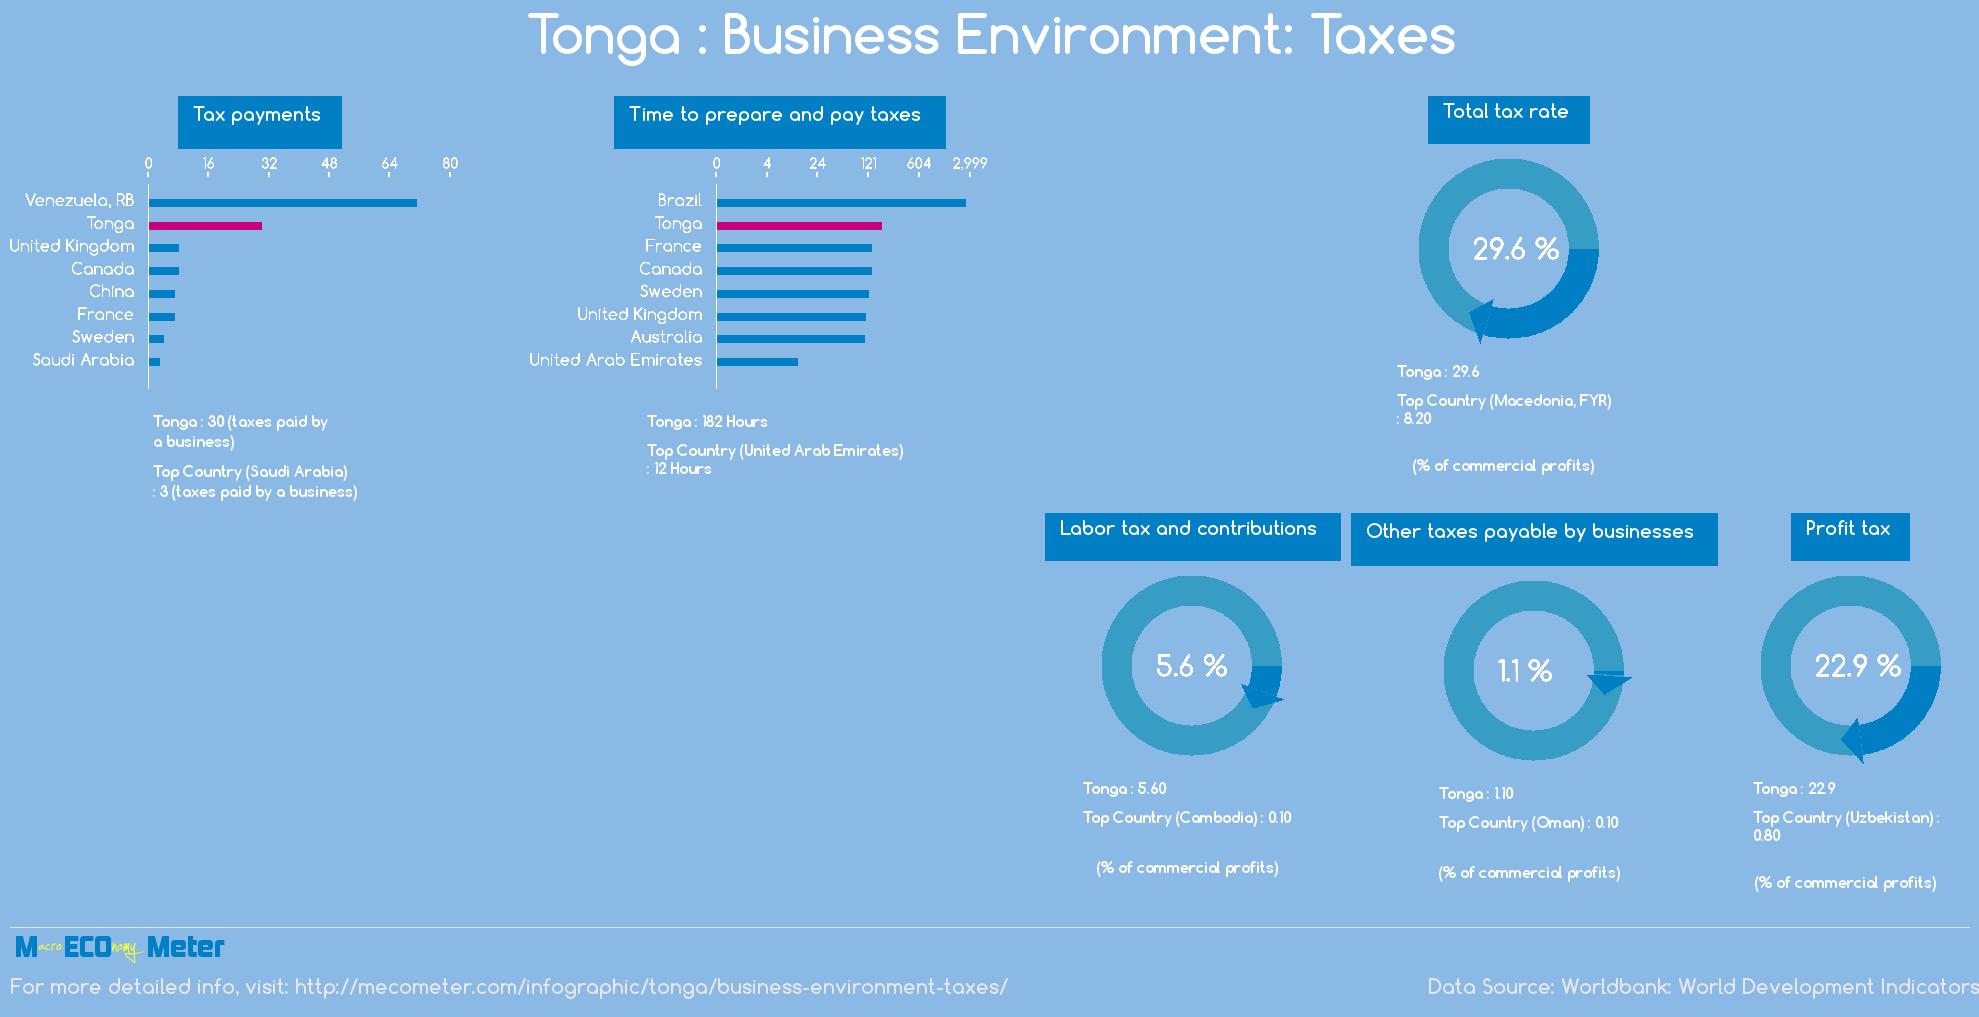 Tonga : Business Environment: Taxes